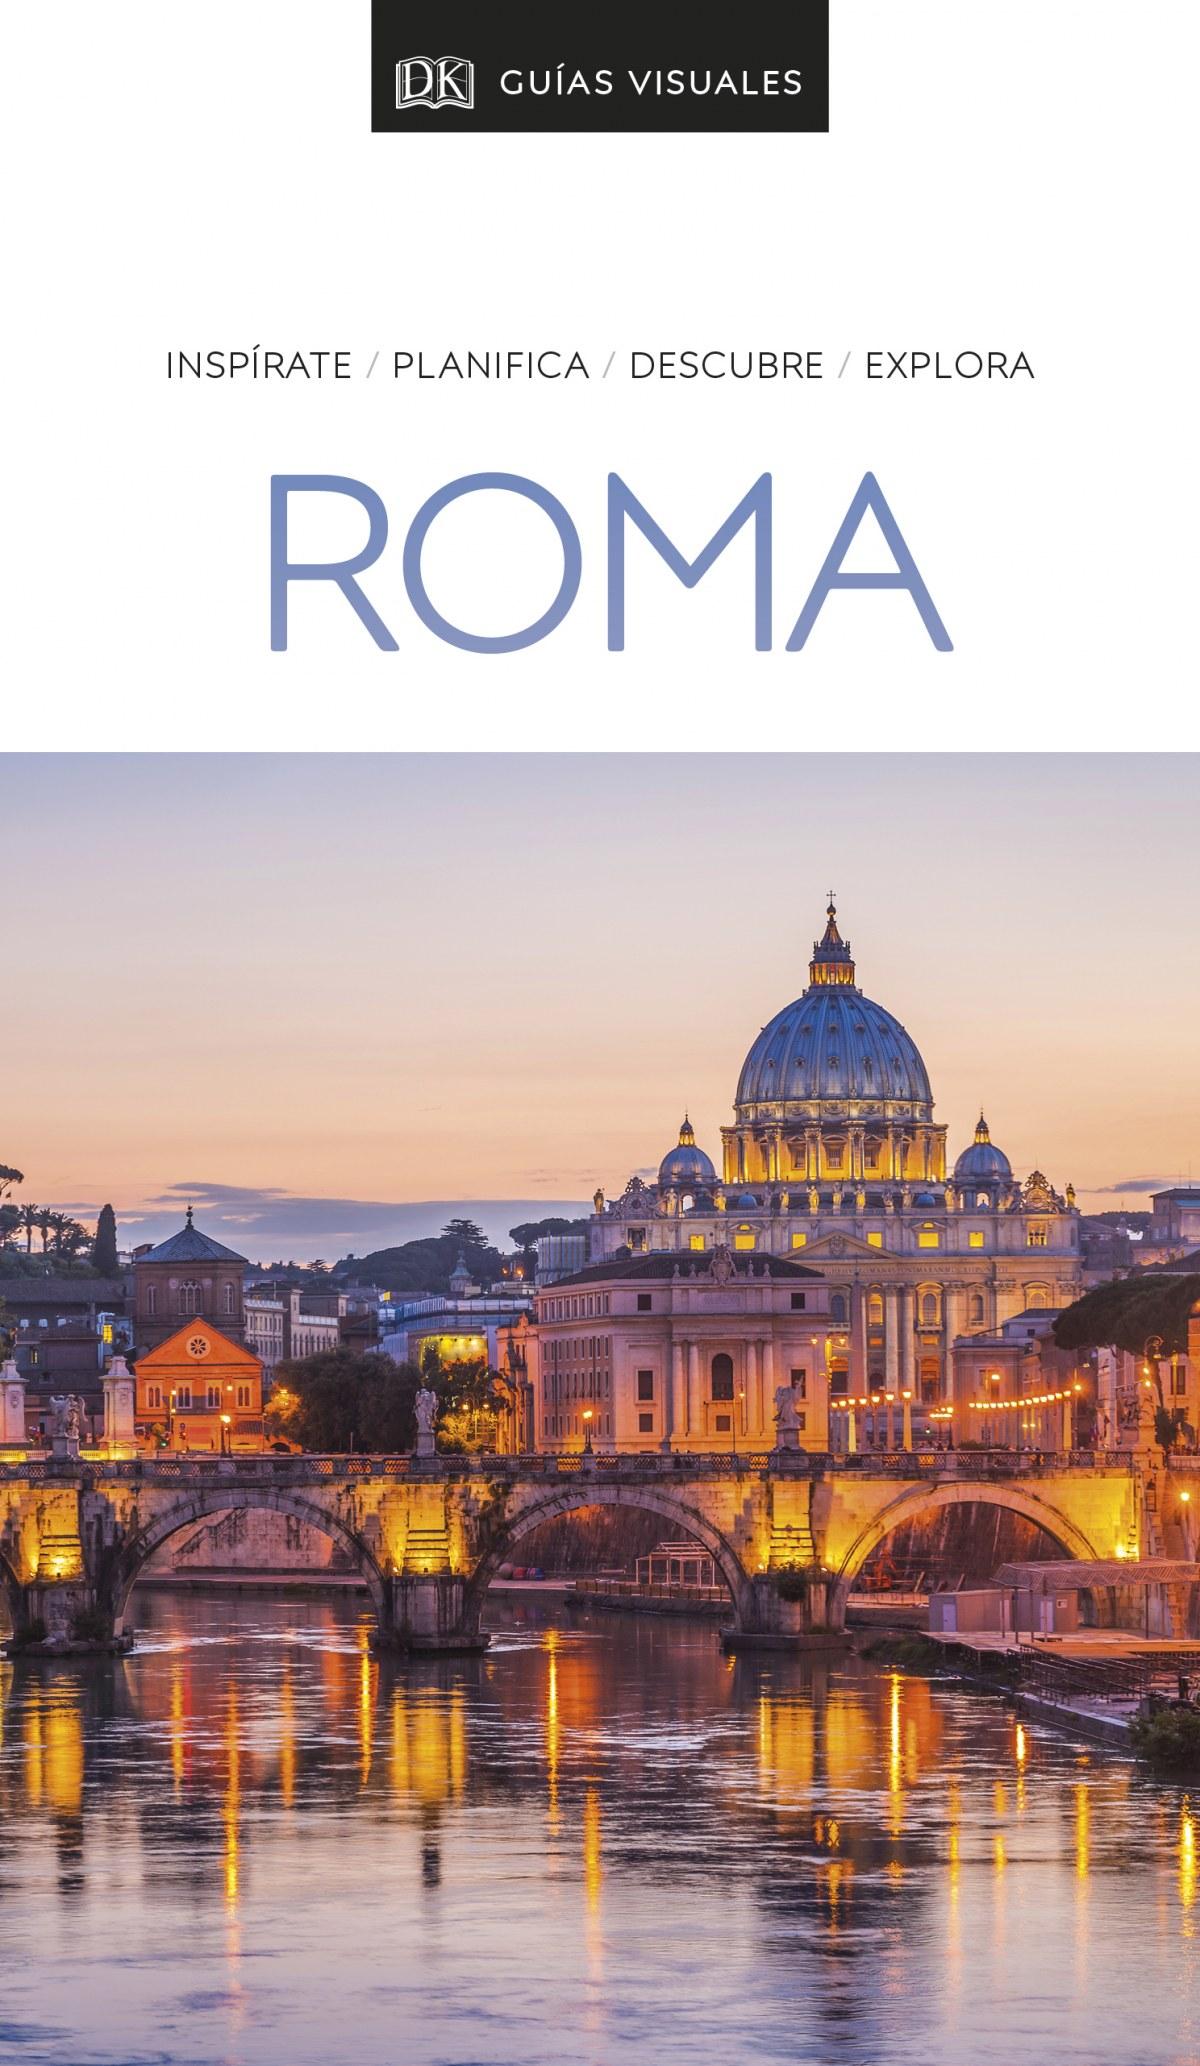 GUÍA VISUAL ROMA 2019 9780241419489